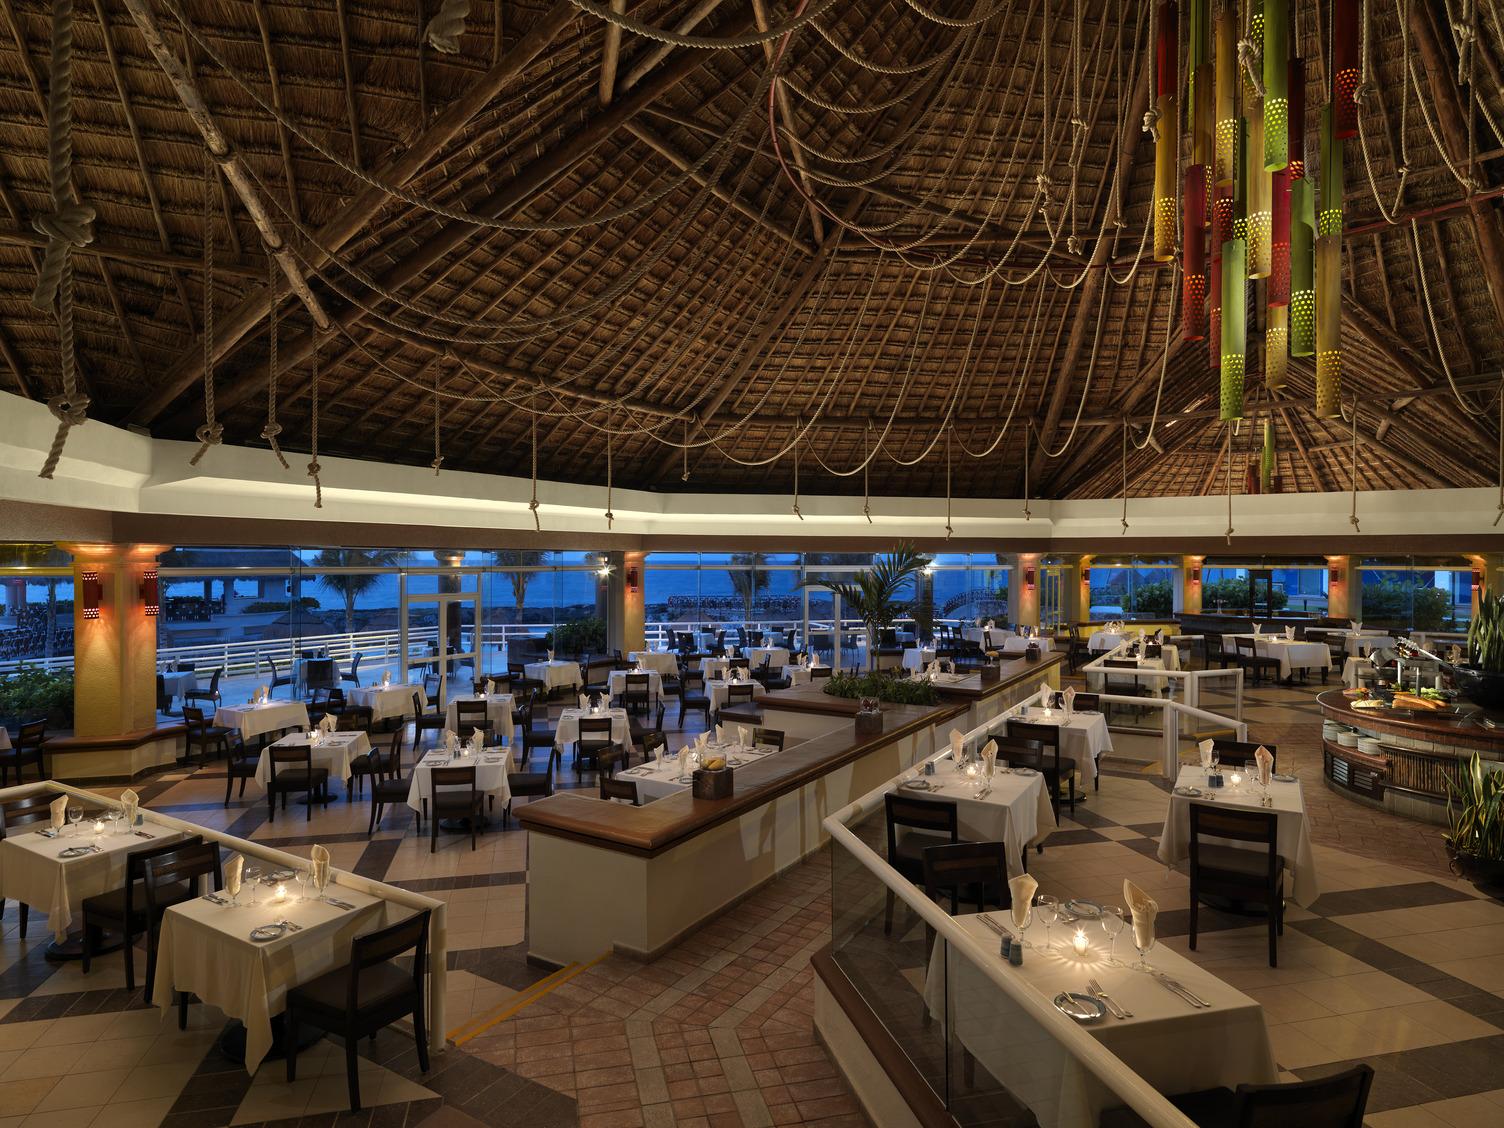 Travel Agency All-Inclusive Resort Heaven at Hard Rock Hotel Riviera Maya 47